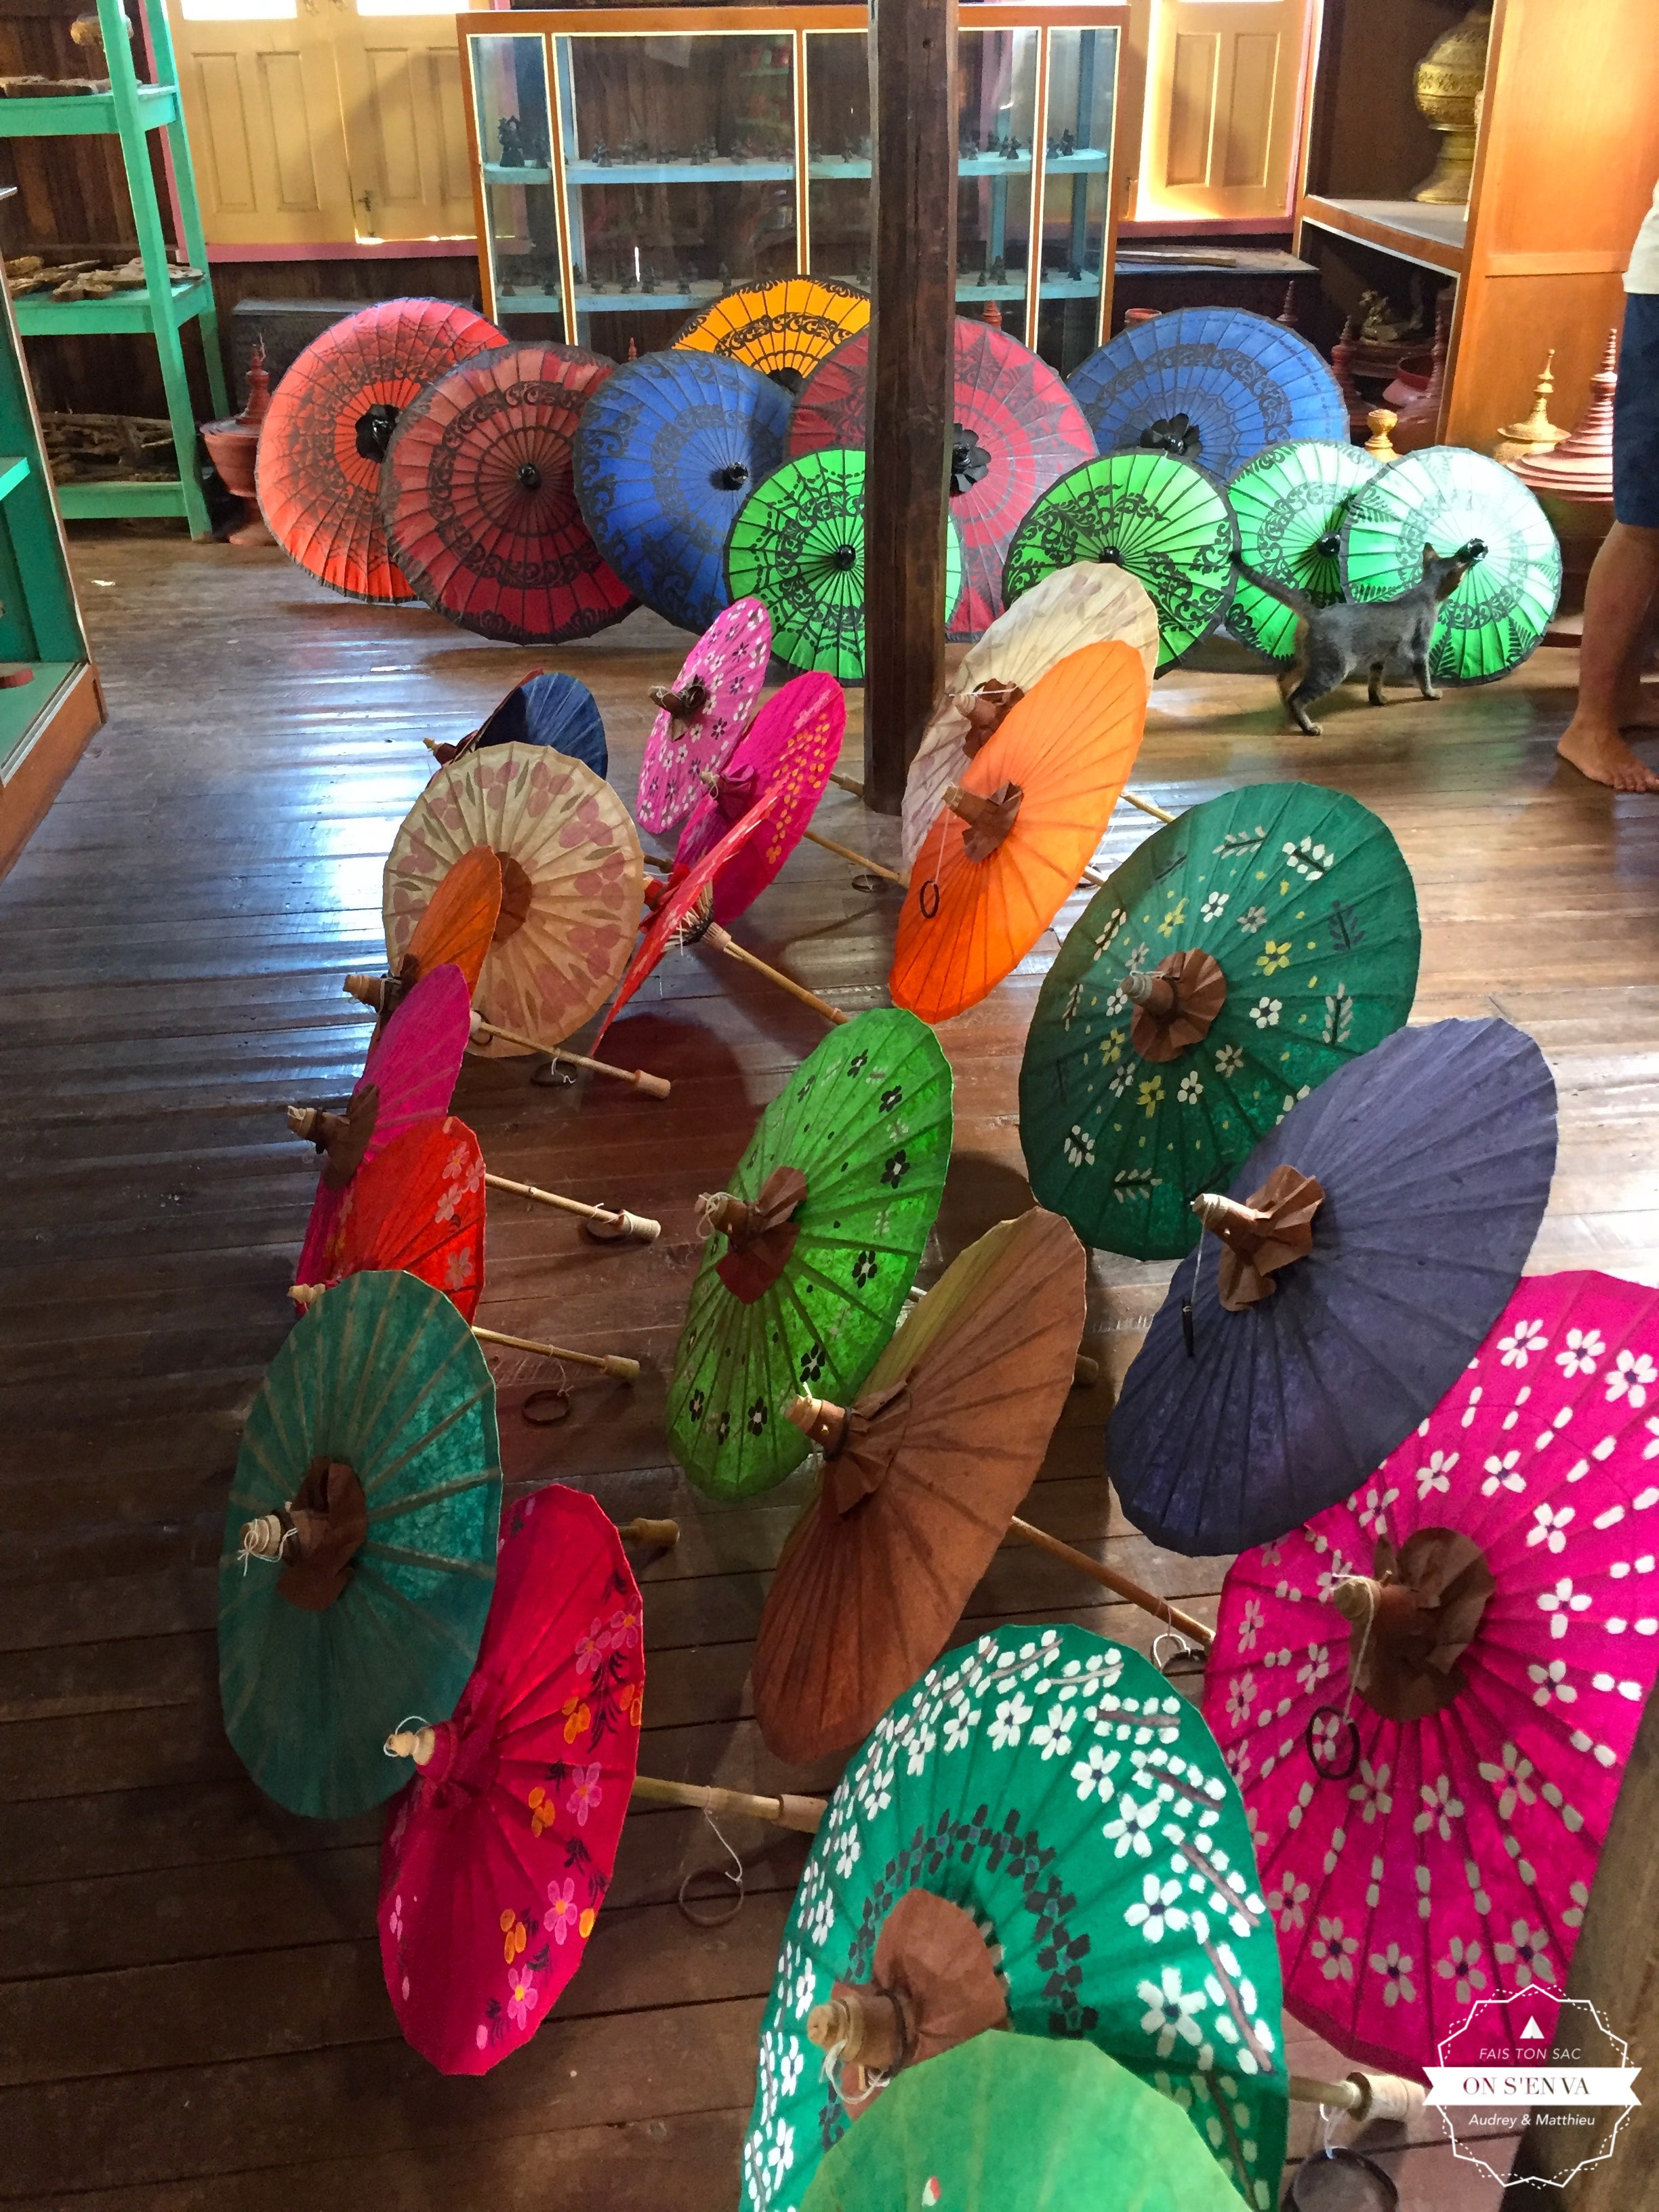 Ateliers d'ombrelles